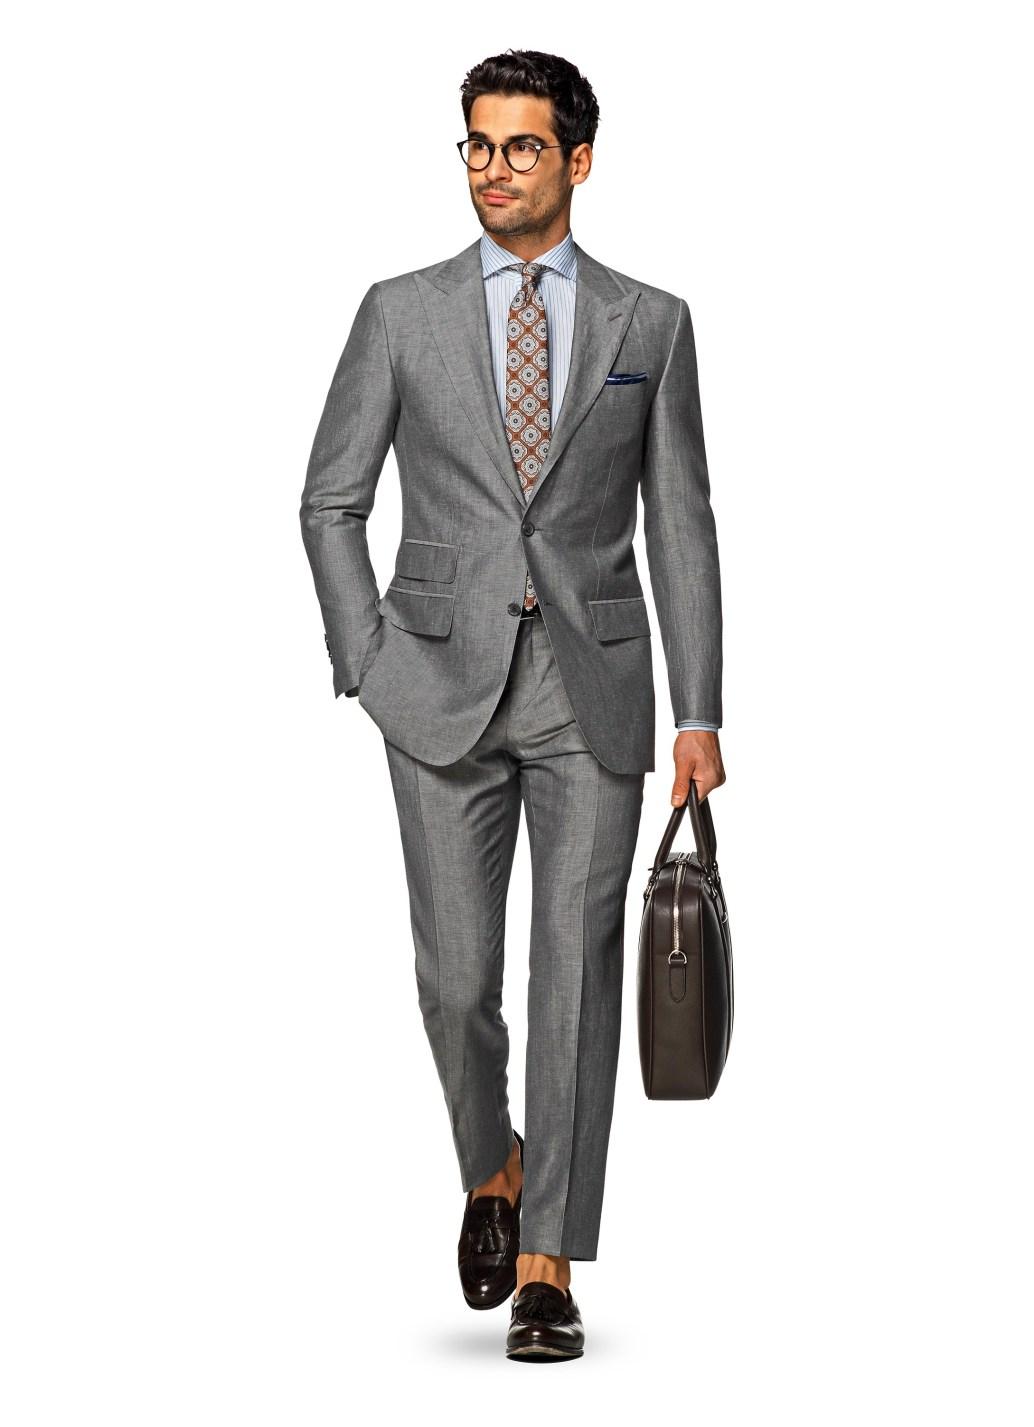 Suits_Grey_Plain_Washington_P5174_Suitsupply_Online_Store_1.jpg